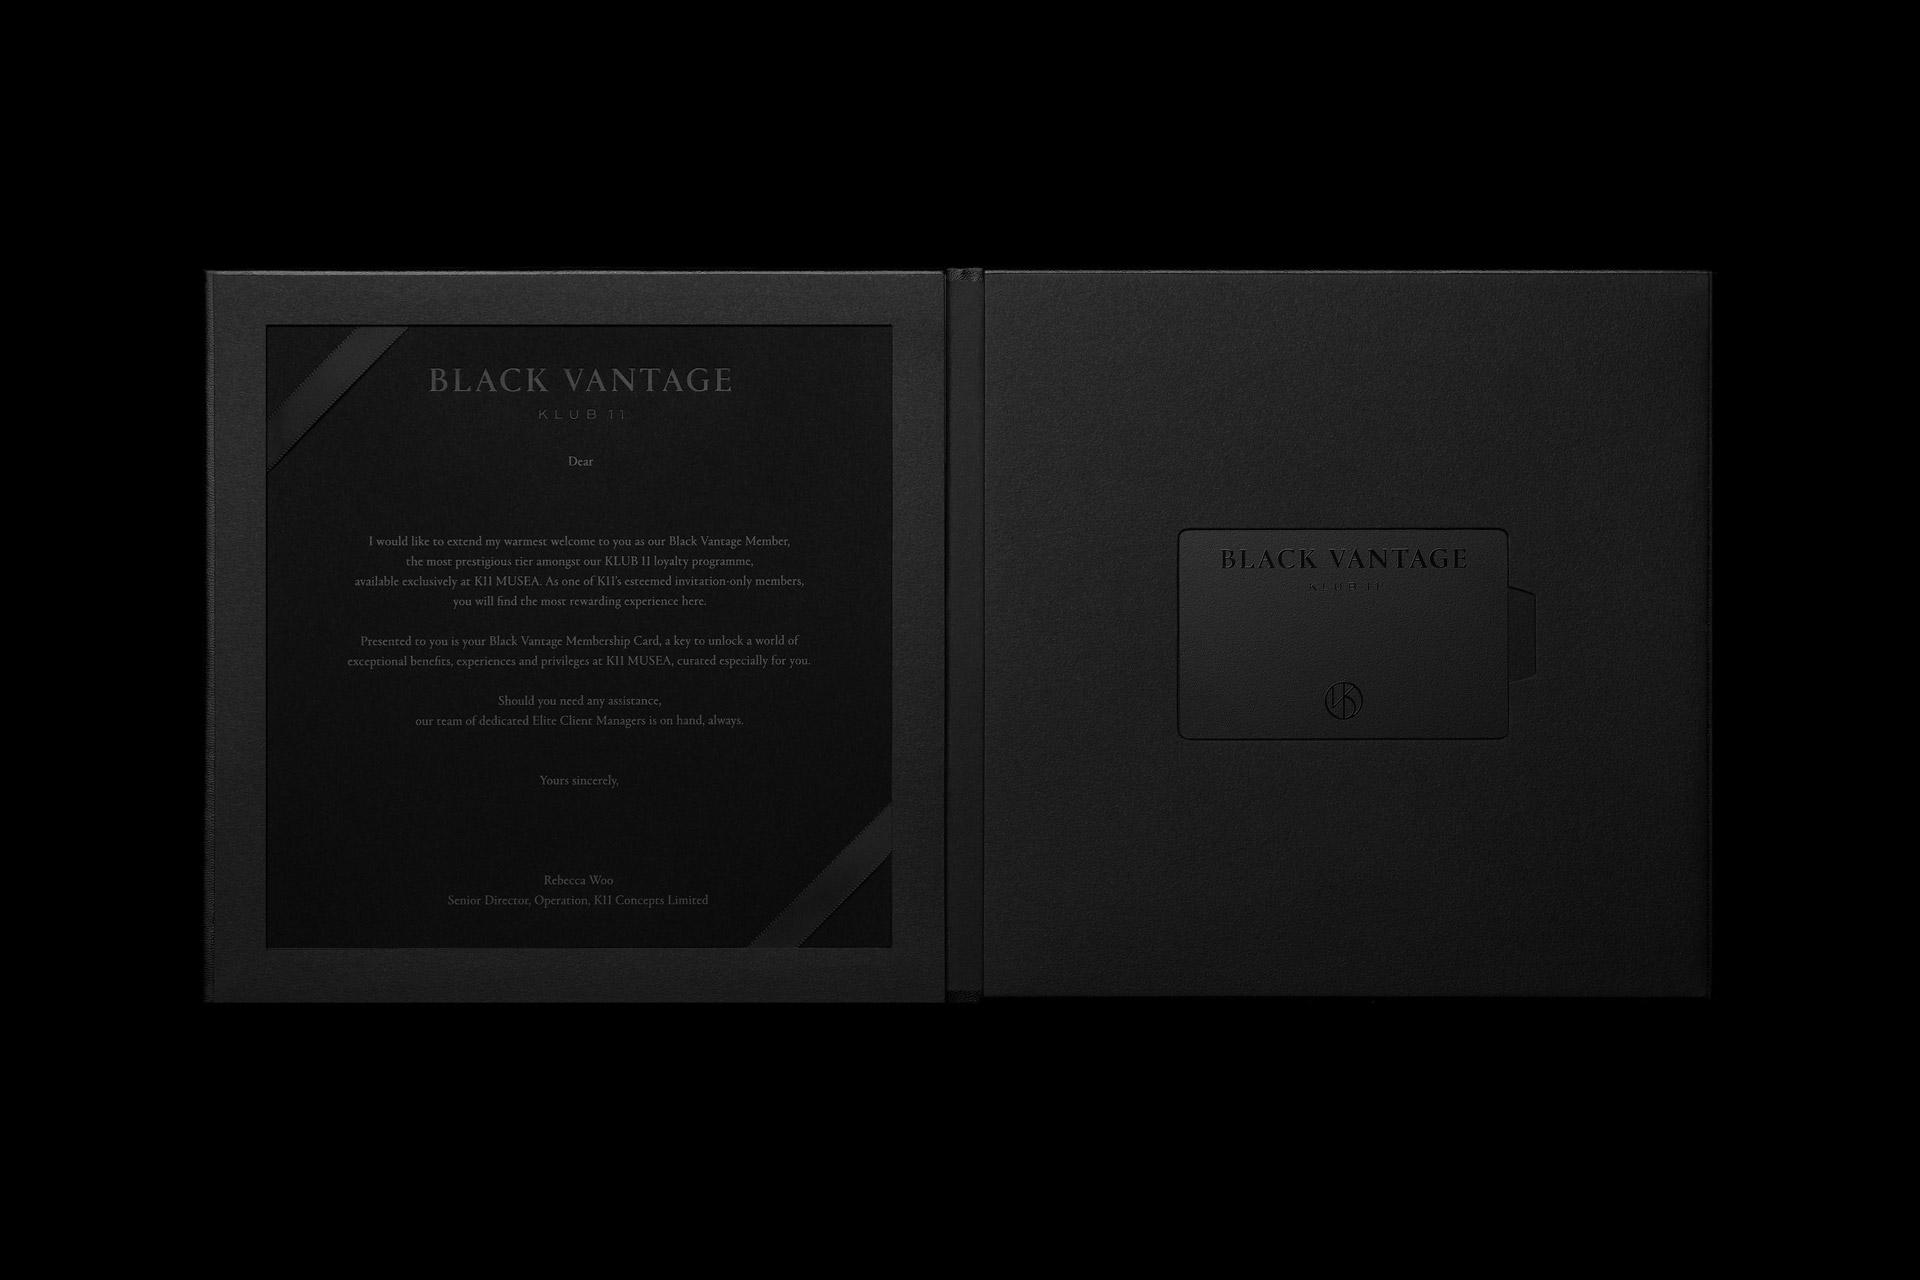 black-vantage_10